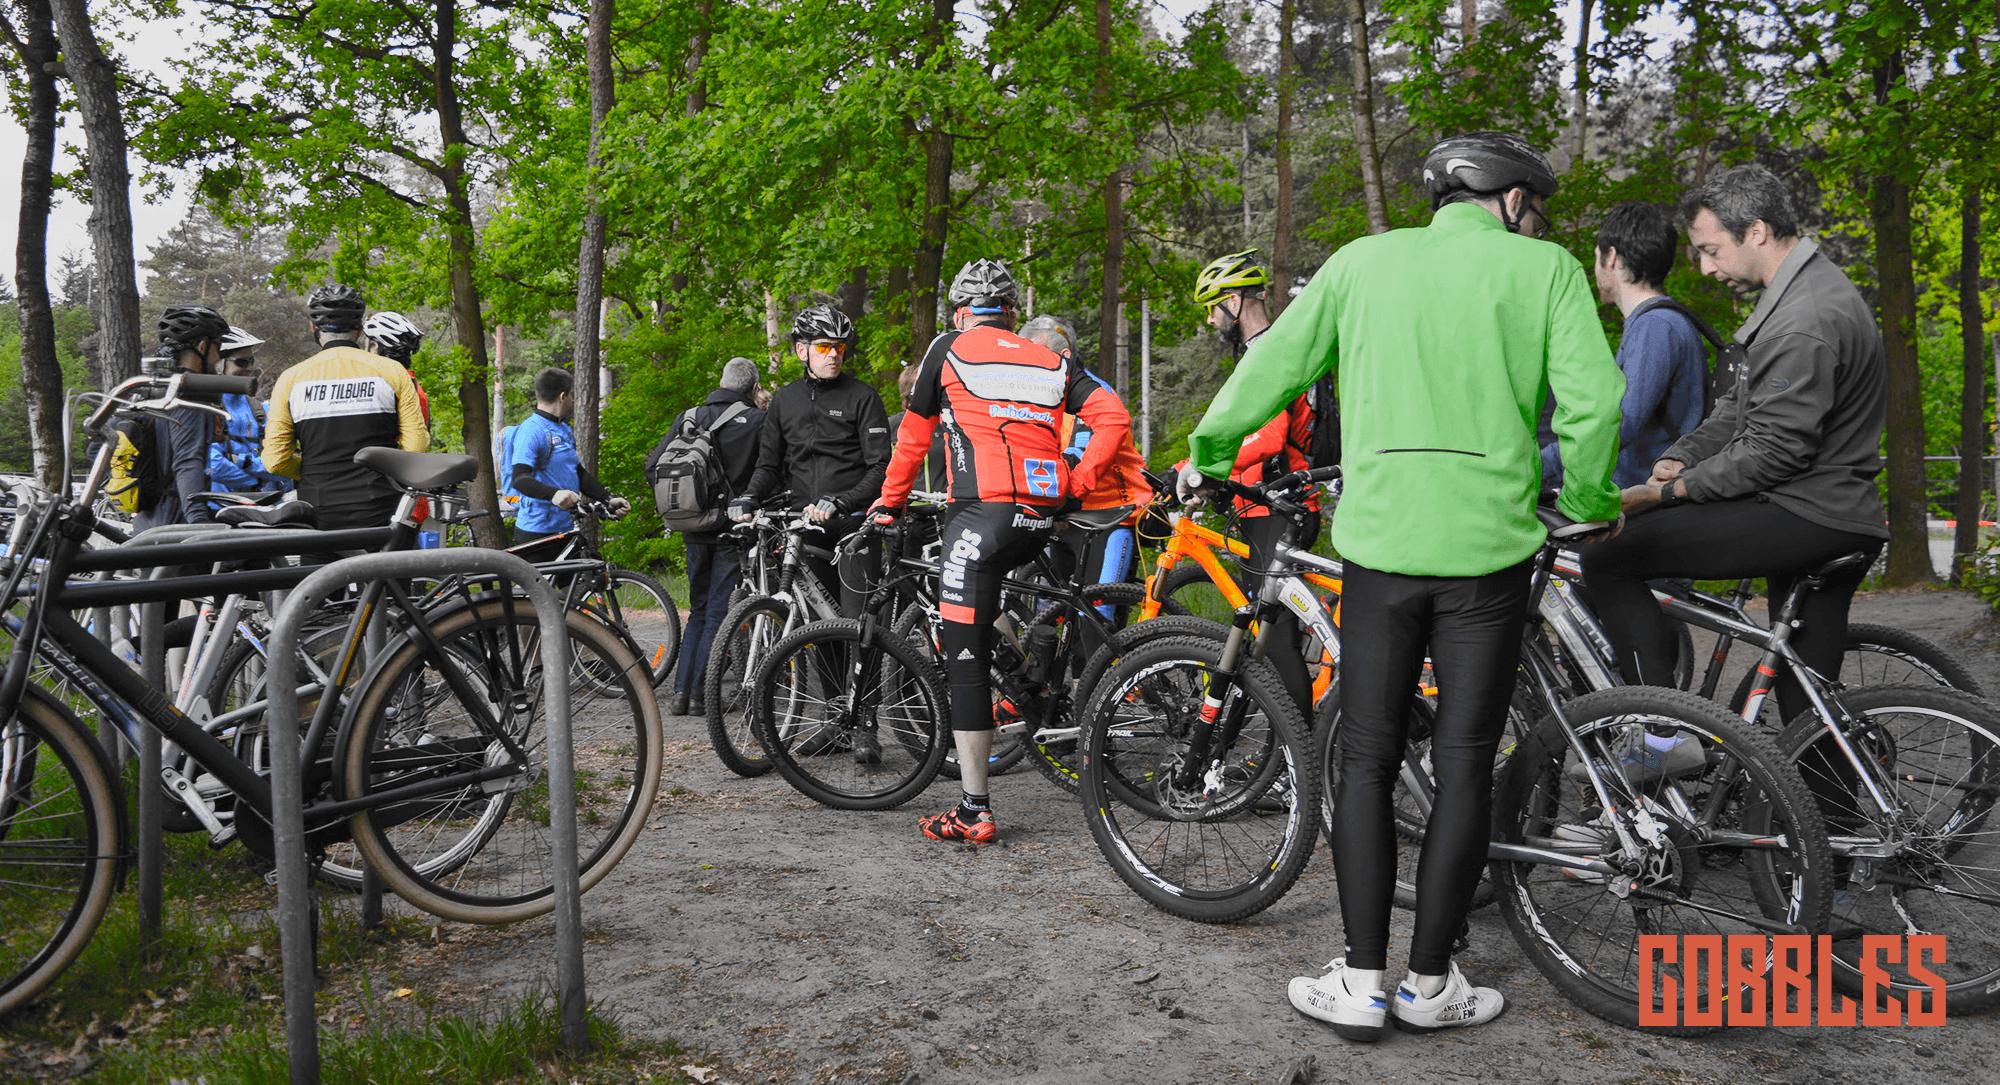 Cobbles Cycling mountainbikeroute Stadsbos013 MTB Tilburg Esbeek Cisco WC Pijnenburg